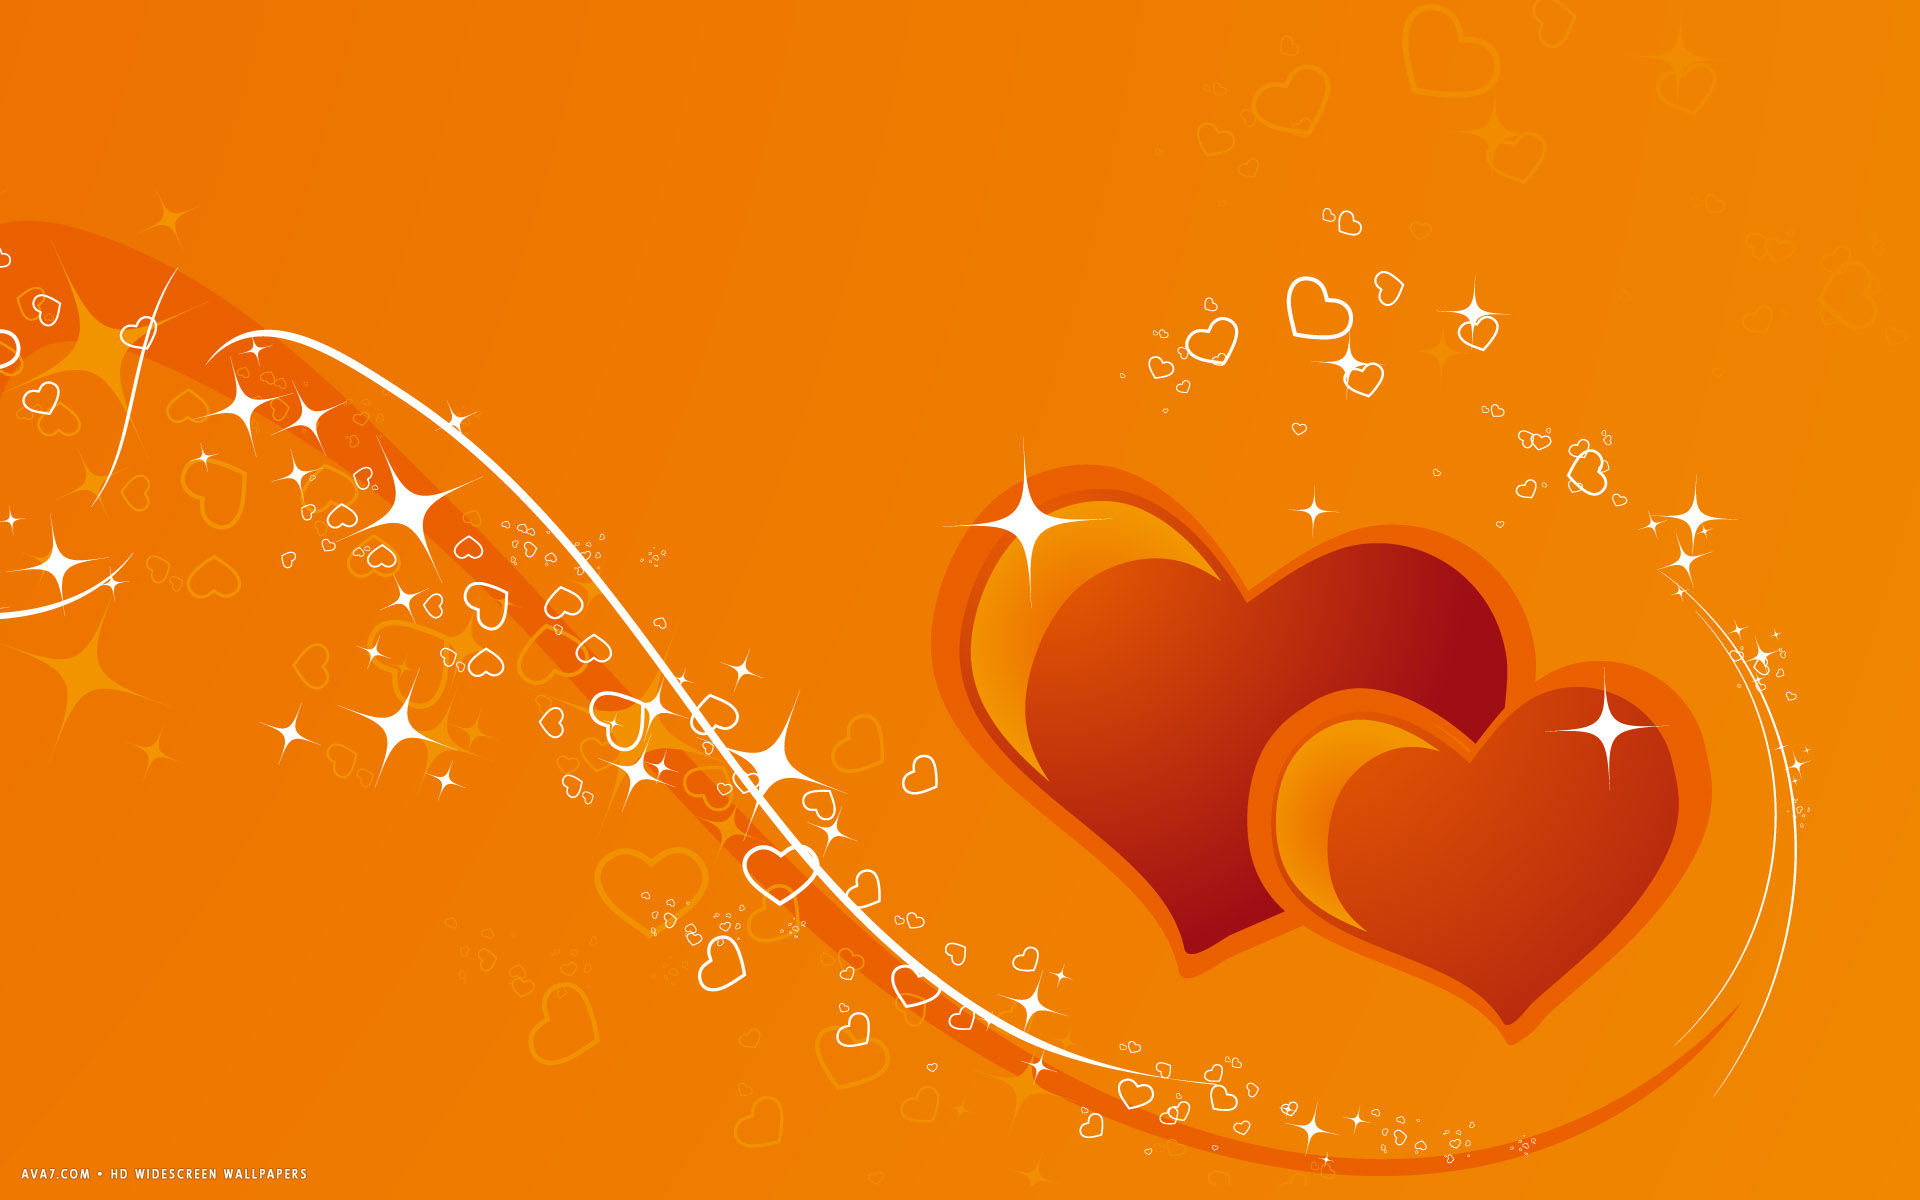 Animal Print Desktop Wallpaper Hearts Two Orange Red Magic Vector Lines Stars Hd